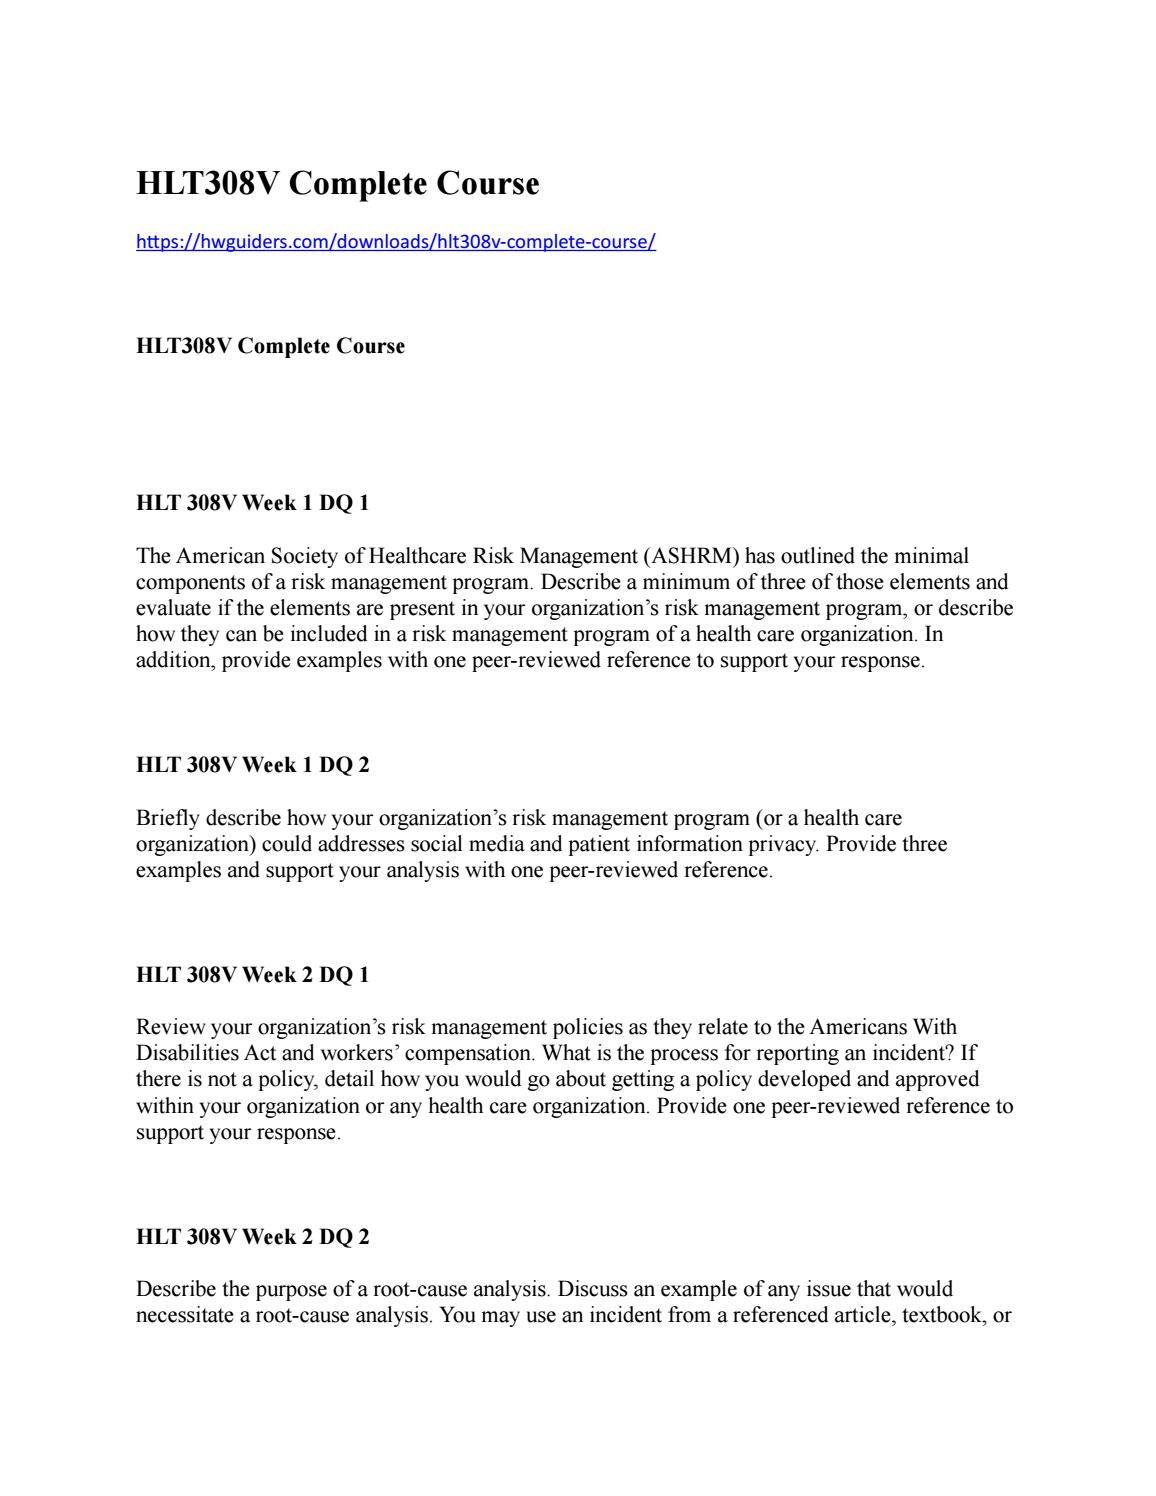 Hlt308v complete course by online homework services - issuu